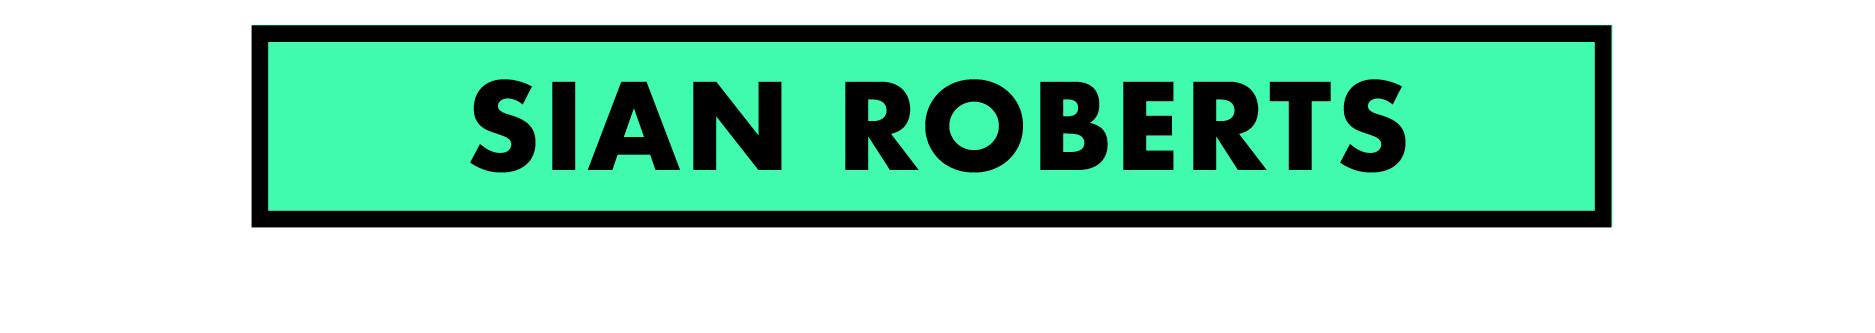 Green_VMFF19_sian_roberts_1